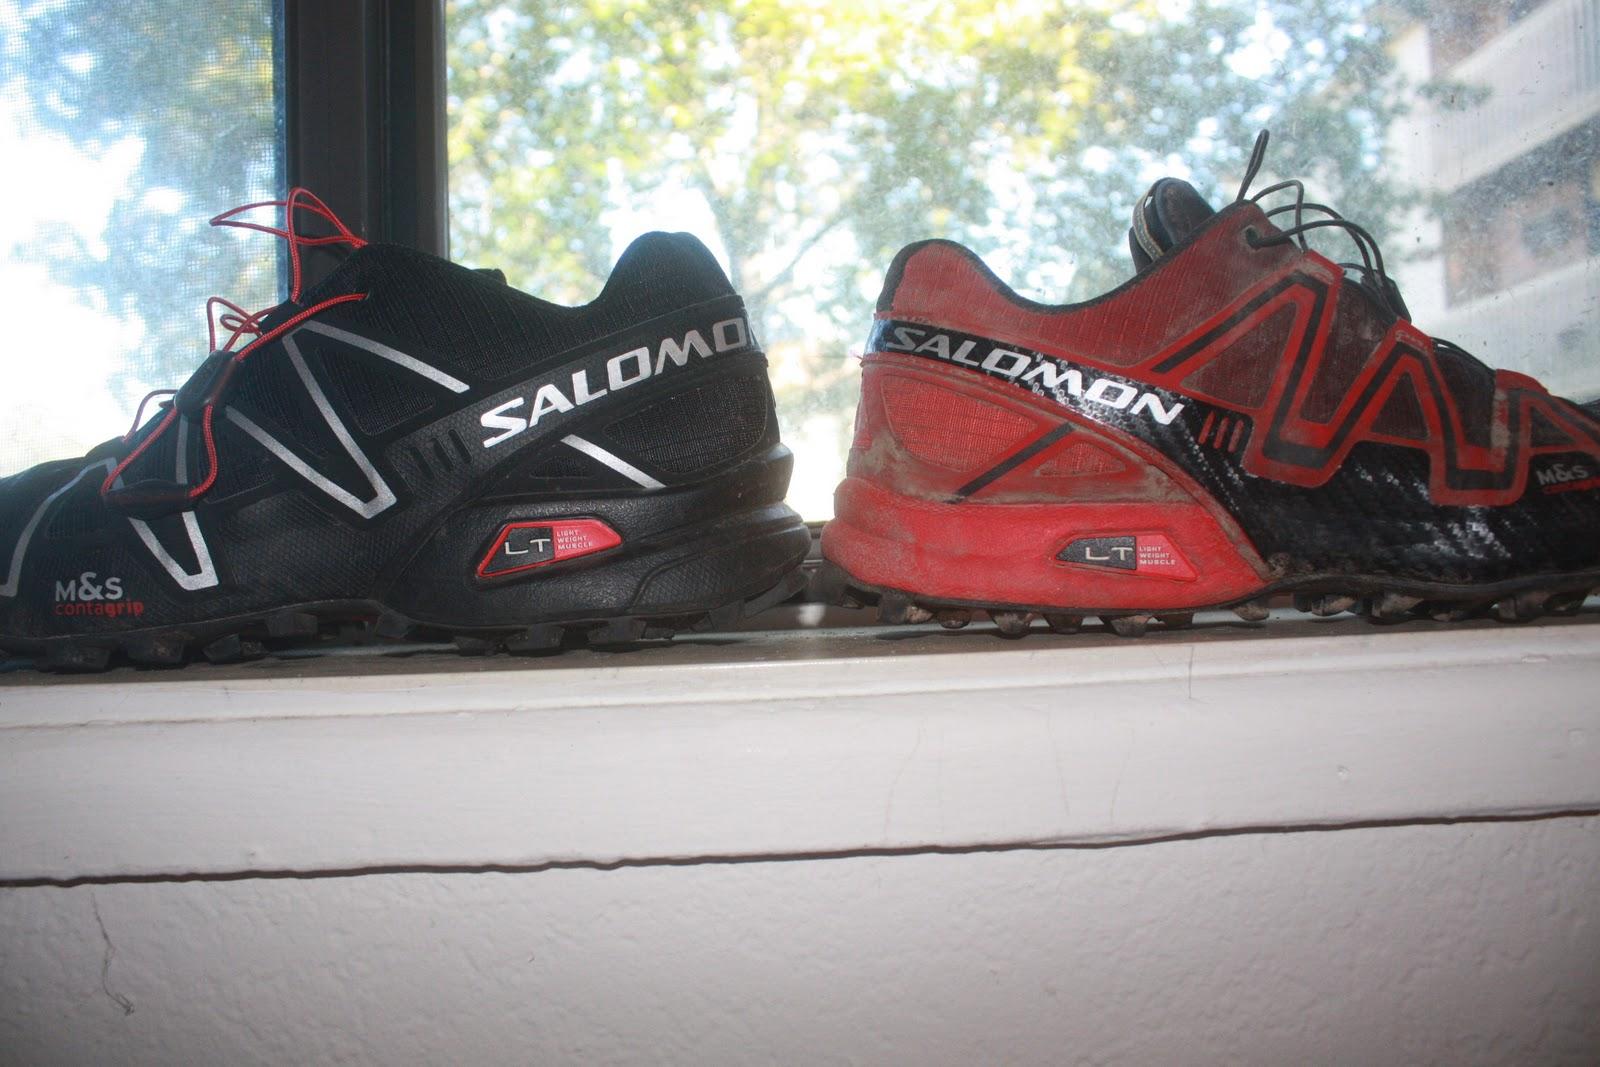 chaussures de séparation 74d14 731df salomon speedcross 2 drop | Becky (Chain Reaction Redwood City)